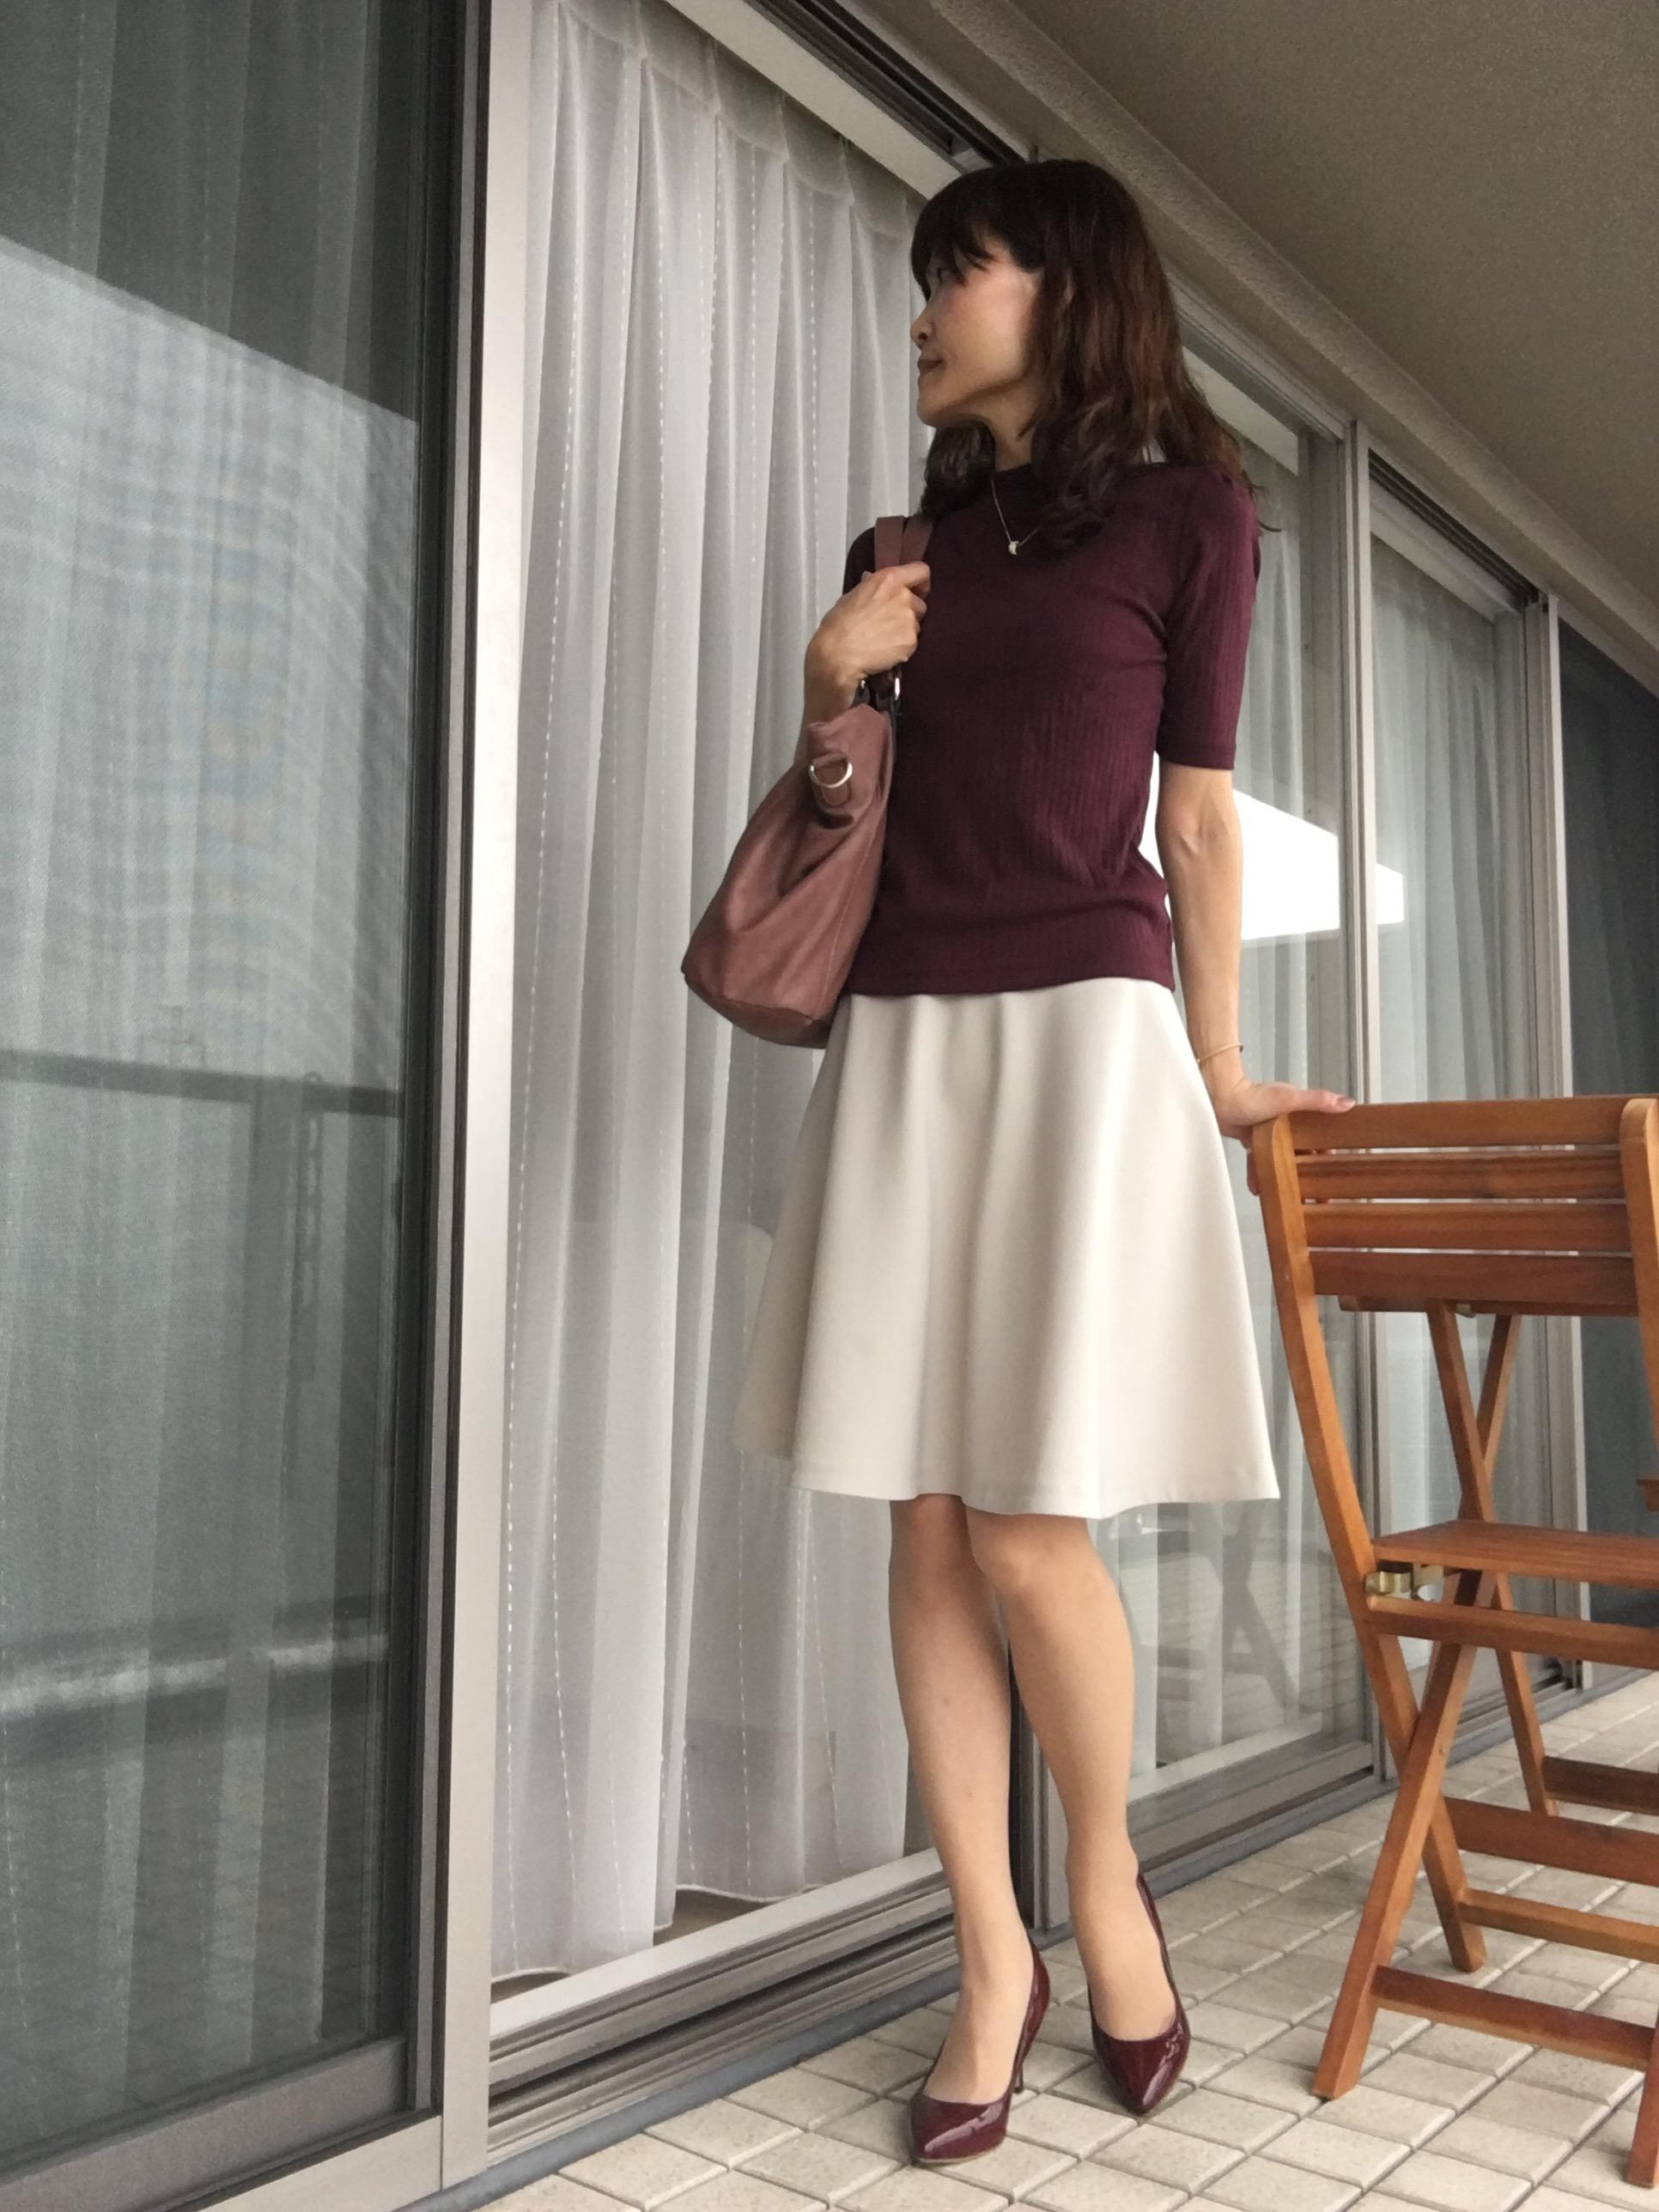 chiyominさんの投稿 - (756452)